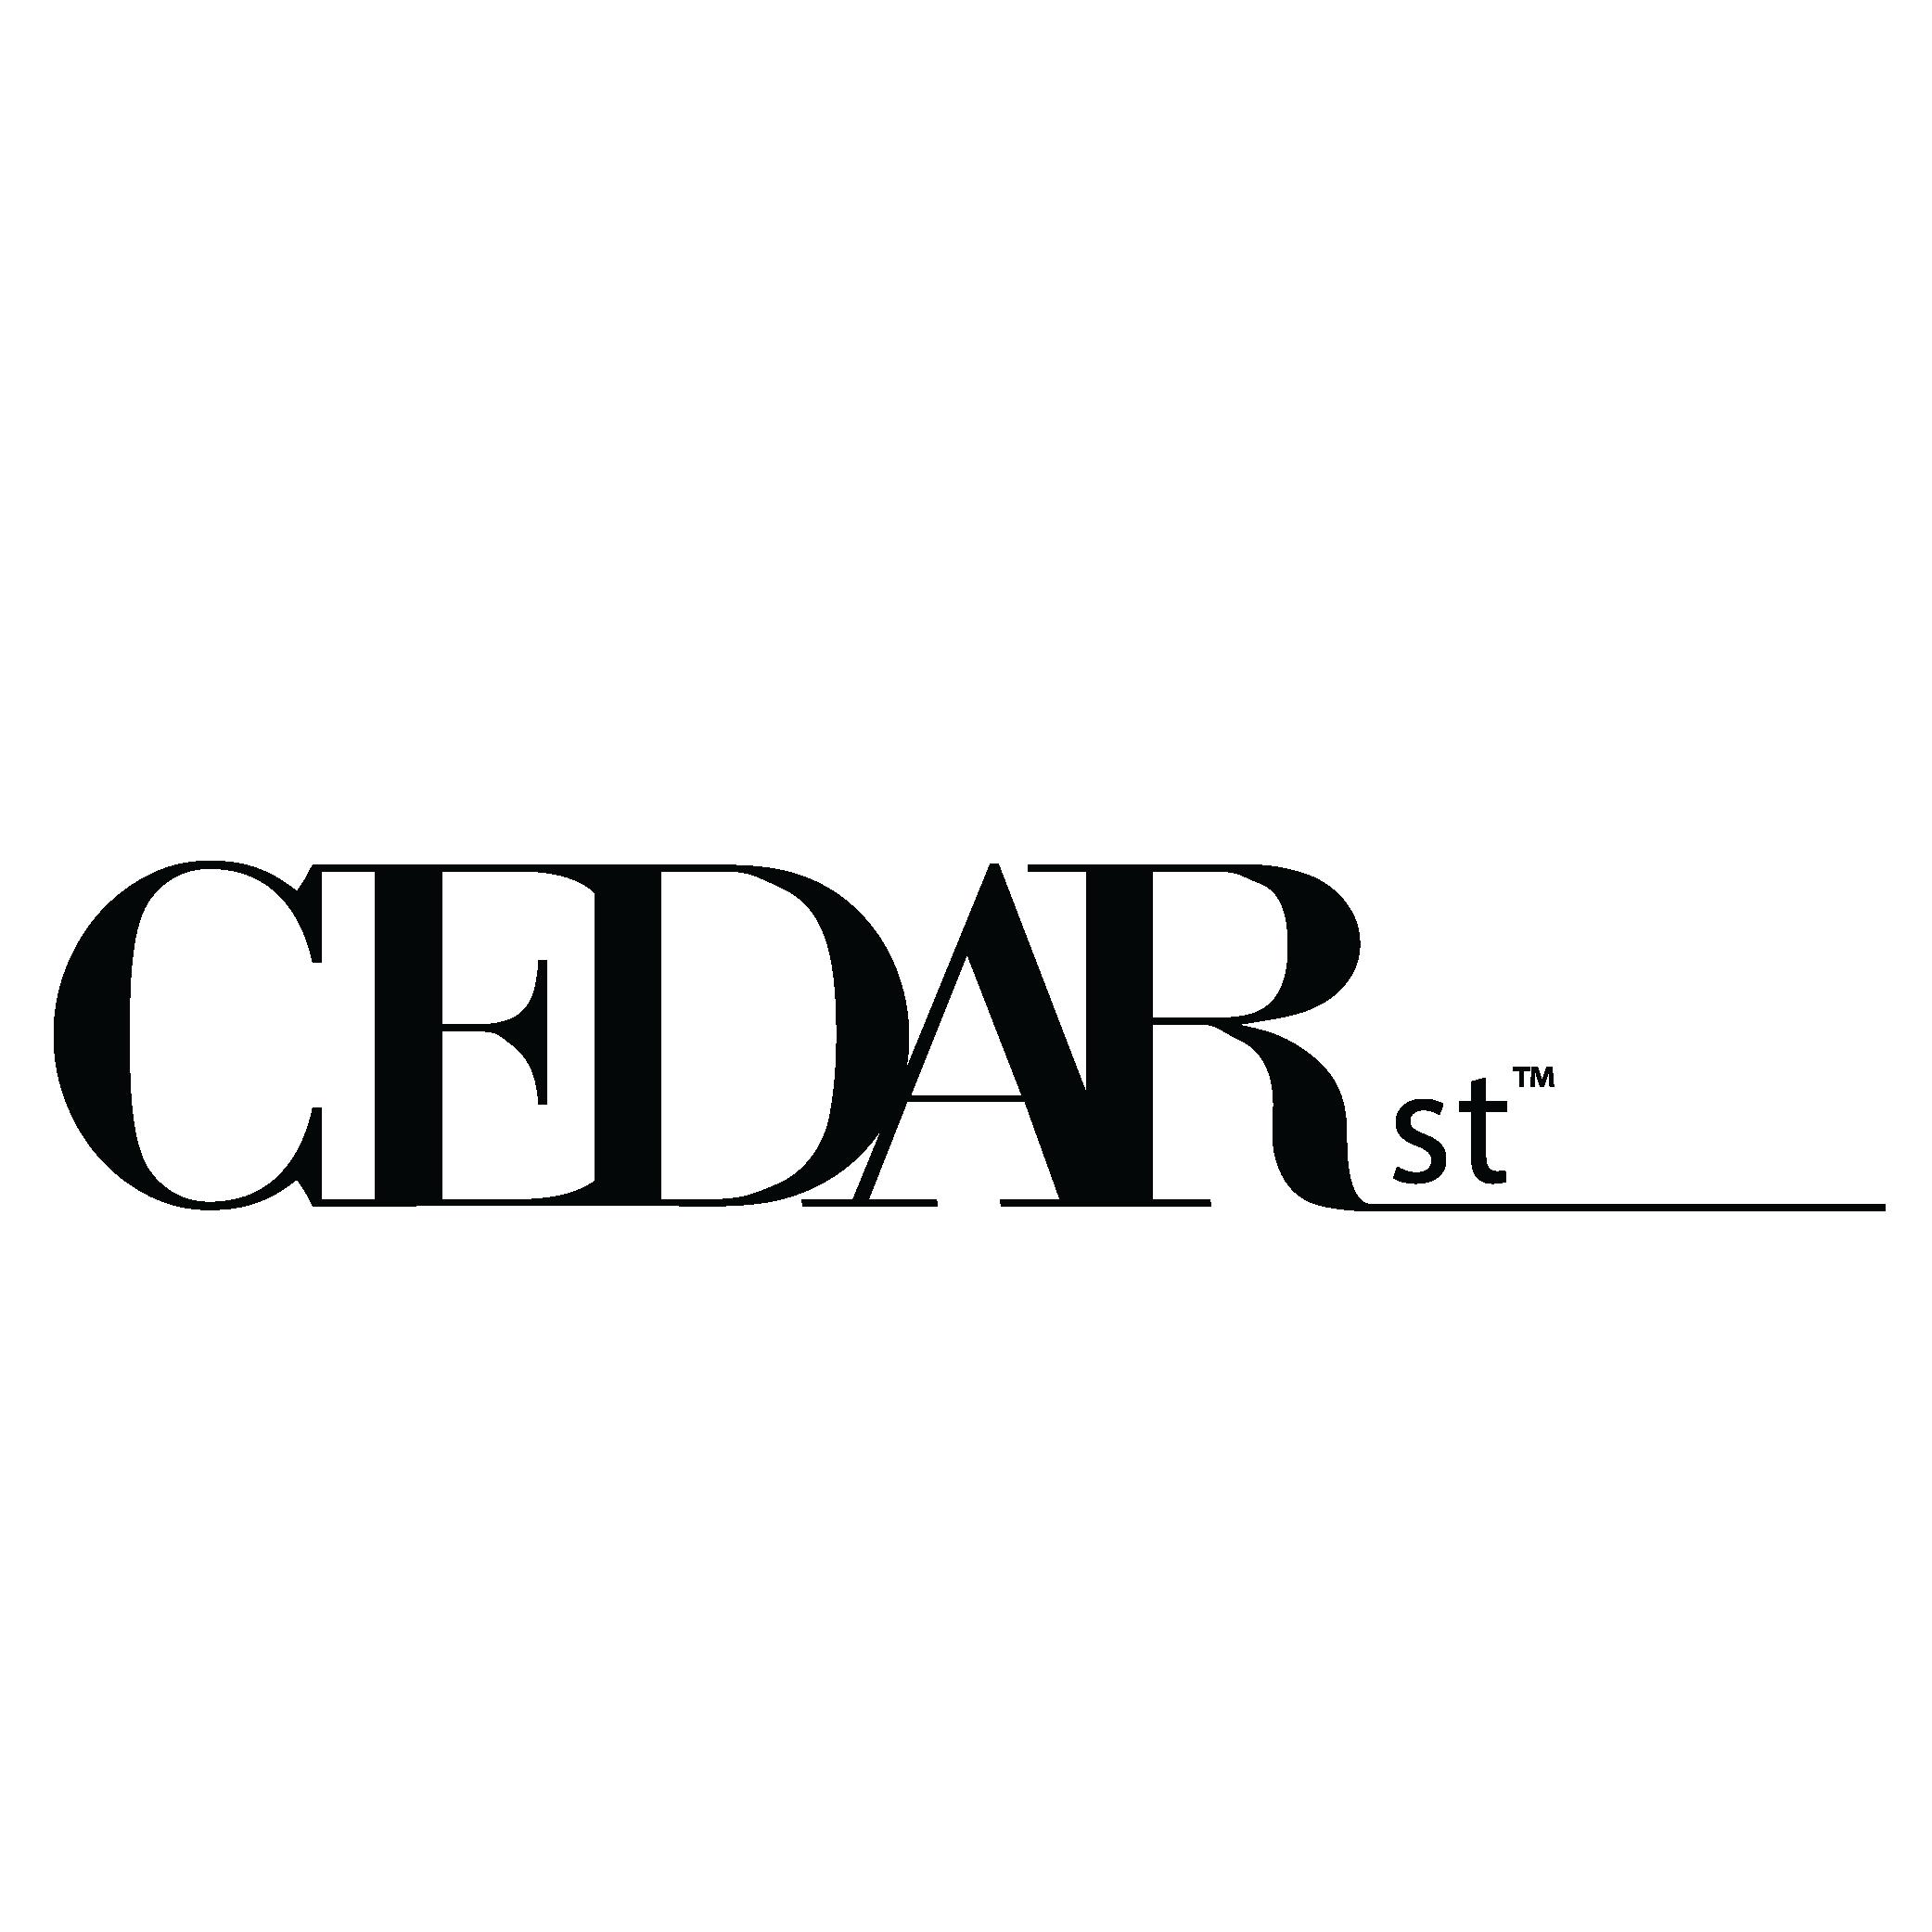 Cedarst_Logo_500px.png